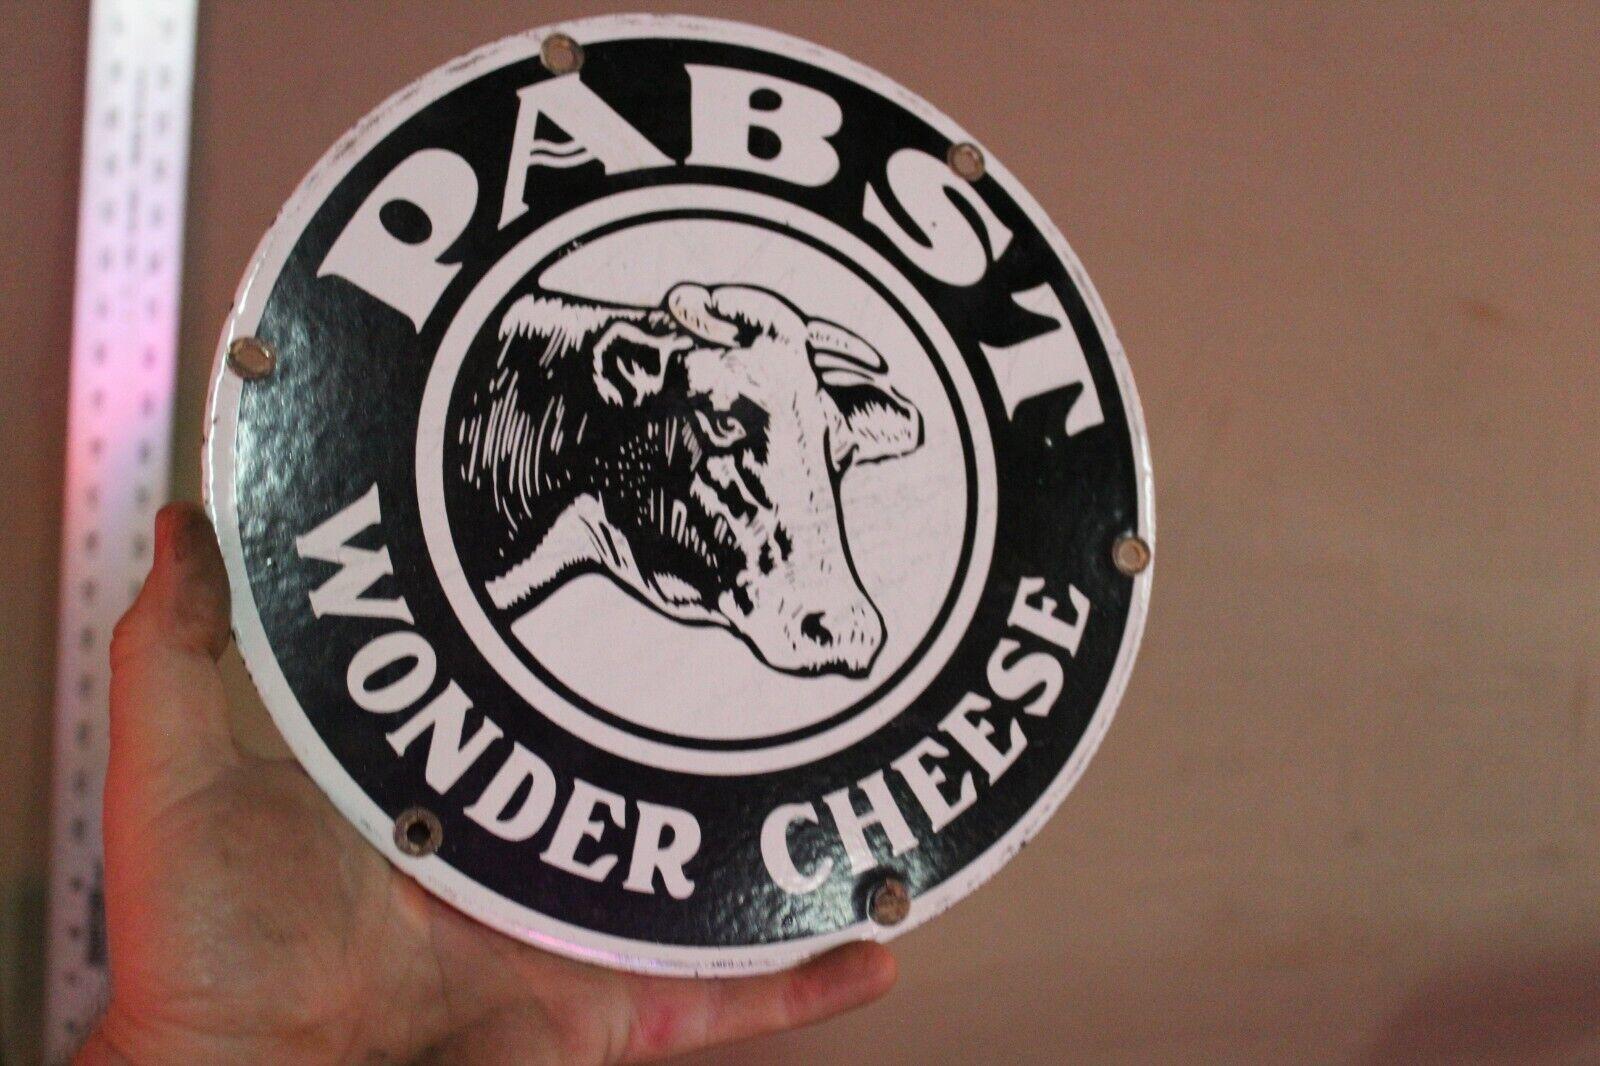 PABST WONDER CHEESE PORCELAIN METAL DEALER SIGN COW BEER MILWAUKEE GAS FARM BARN - $18.21